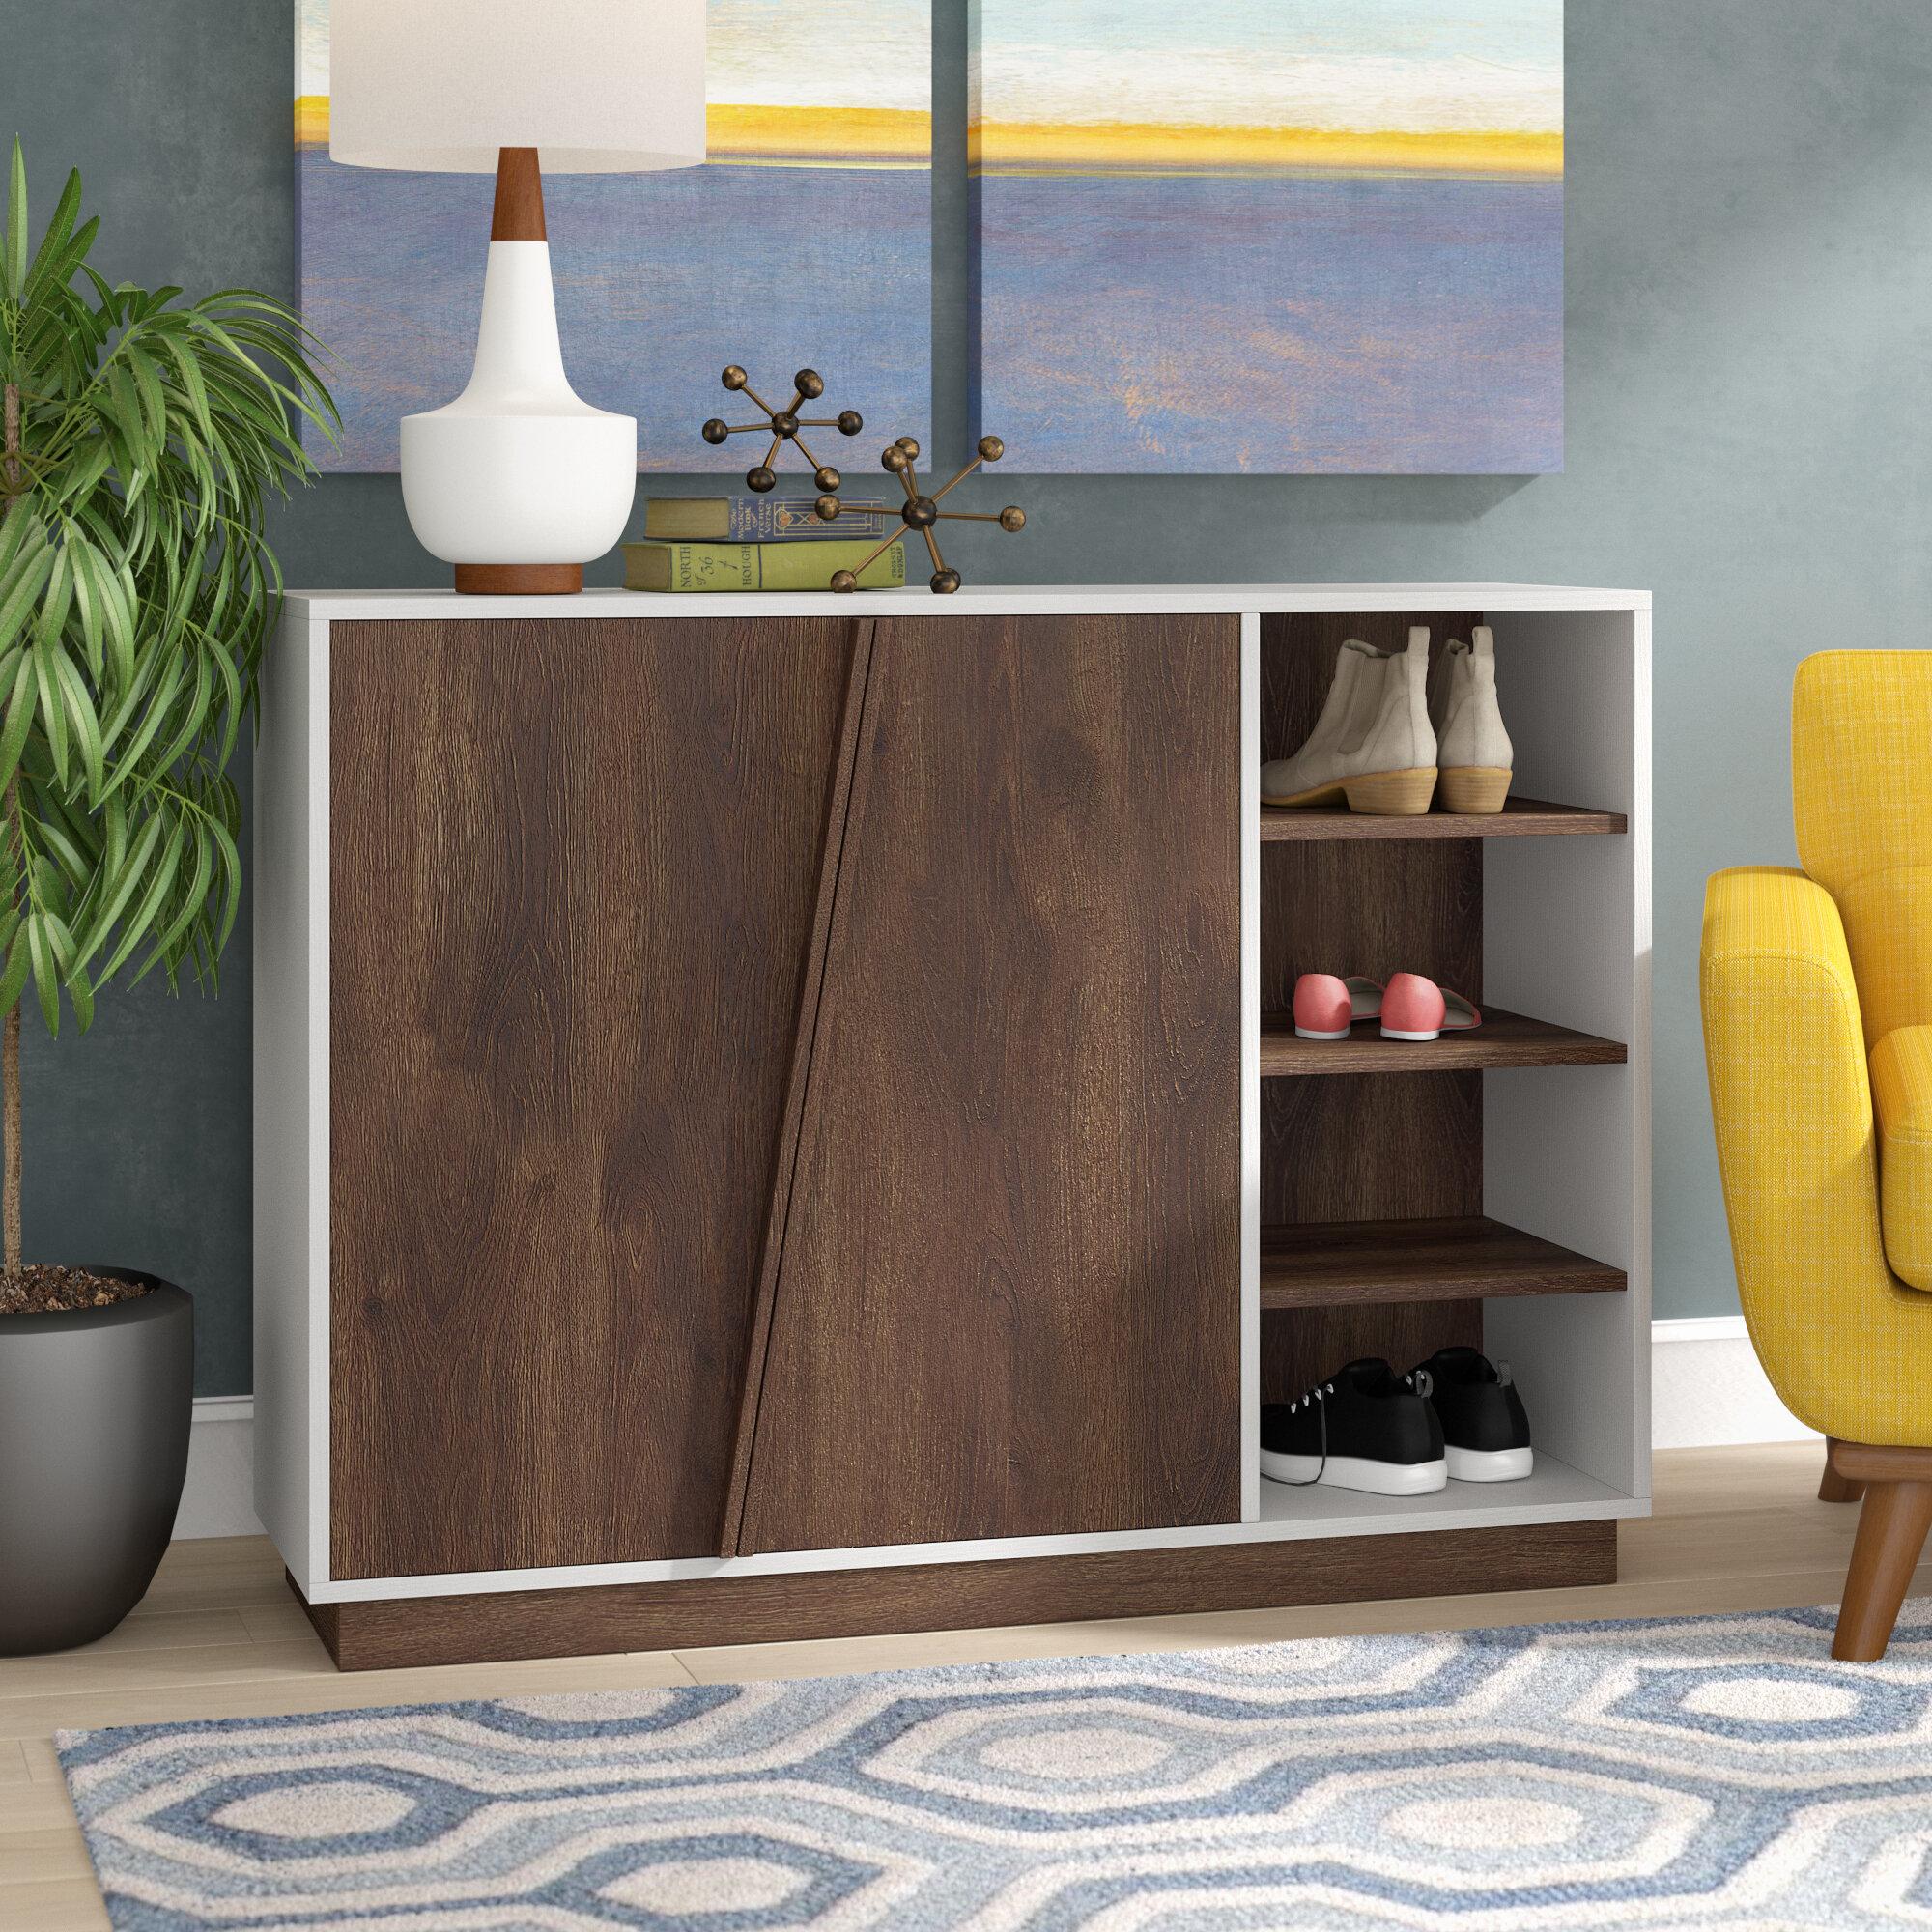 Corrigan Studio 16 Pair Shoe Storage Cabinet Reviews Wayfair